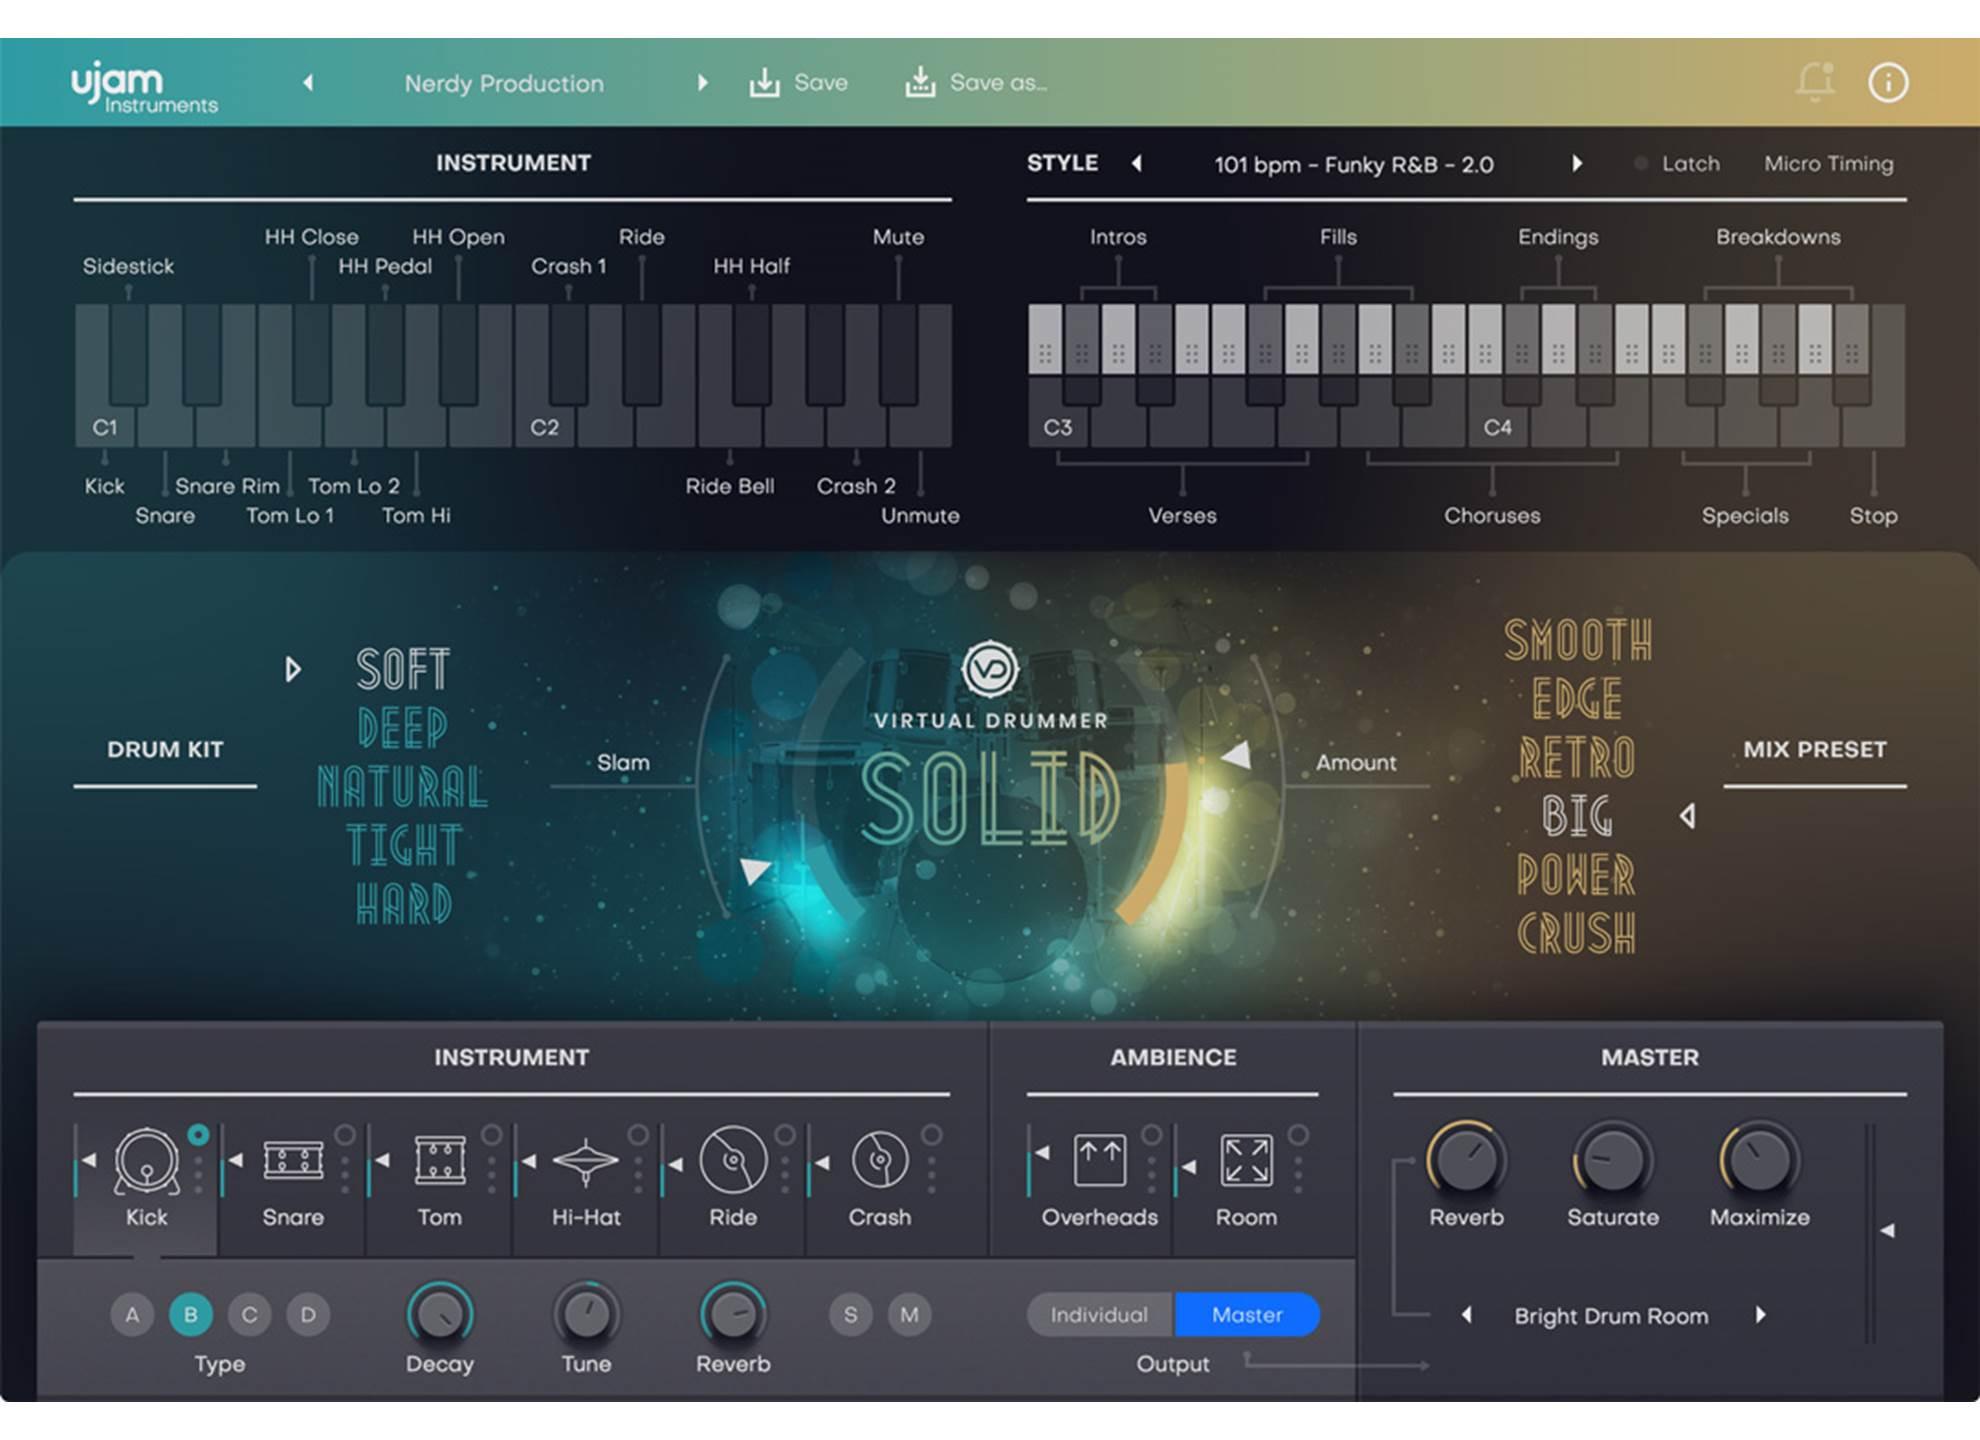 Virtual Drummer Solid 2